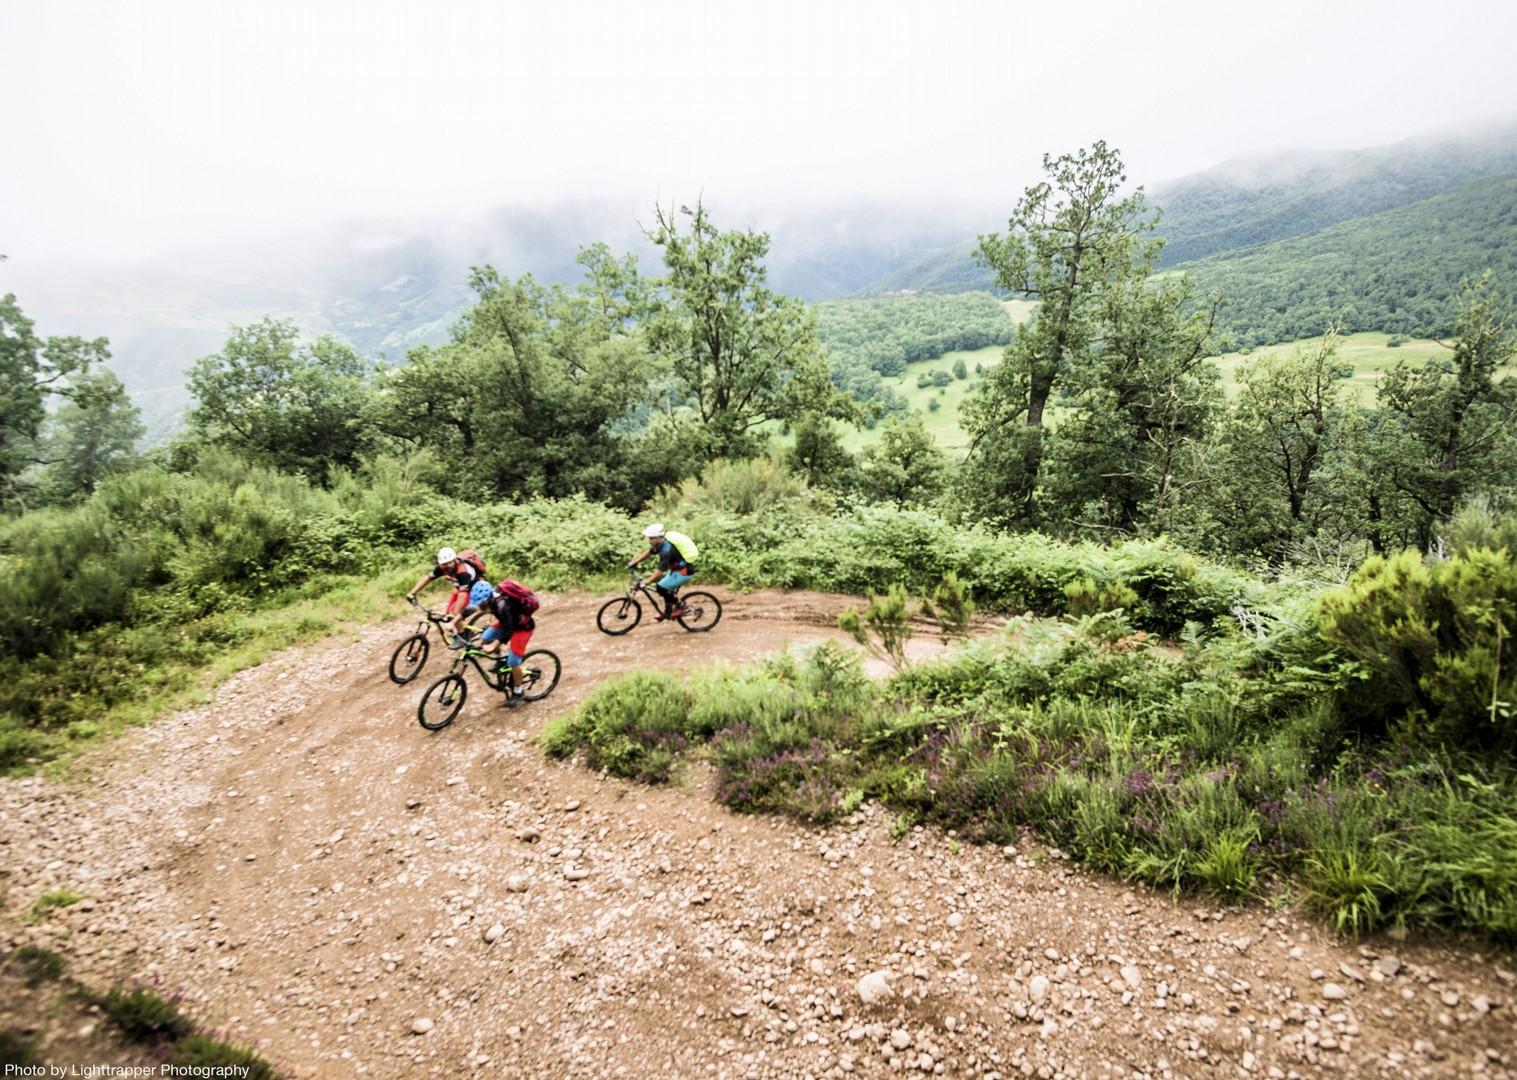 wide-open-road-climb-mountain-biking-northern-spain-picos-de-europa.jpg - Spain - Picos de Europa - Trans Picos - Guided Mountain Bike Holiday - Mountain Biking